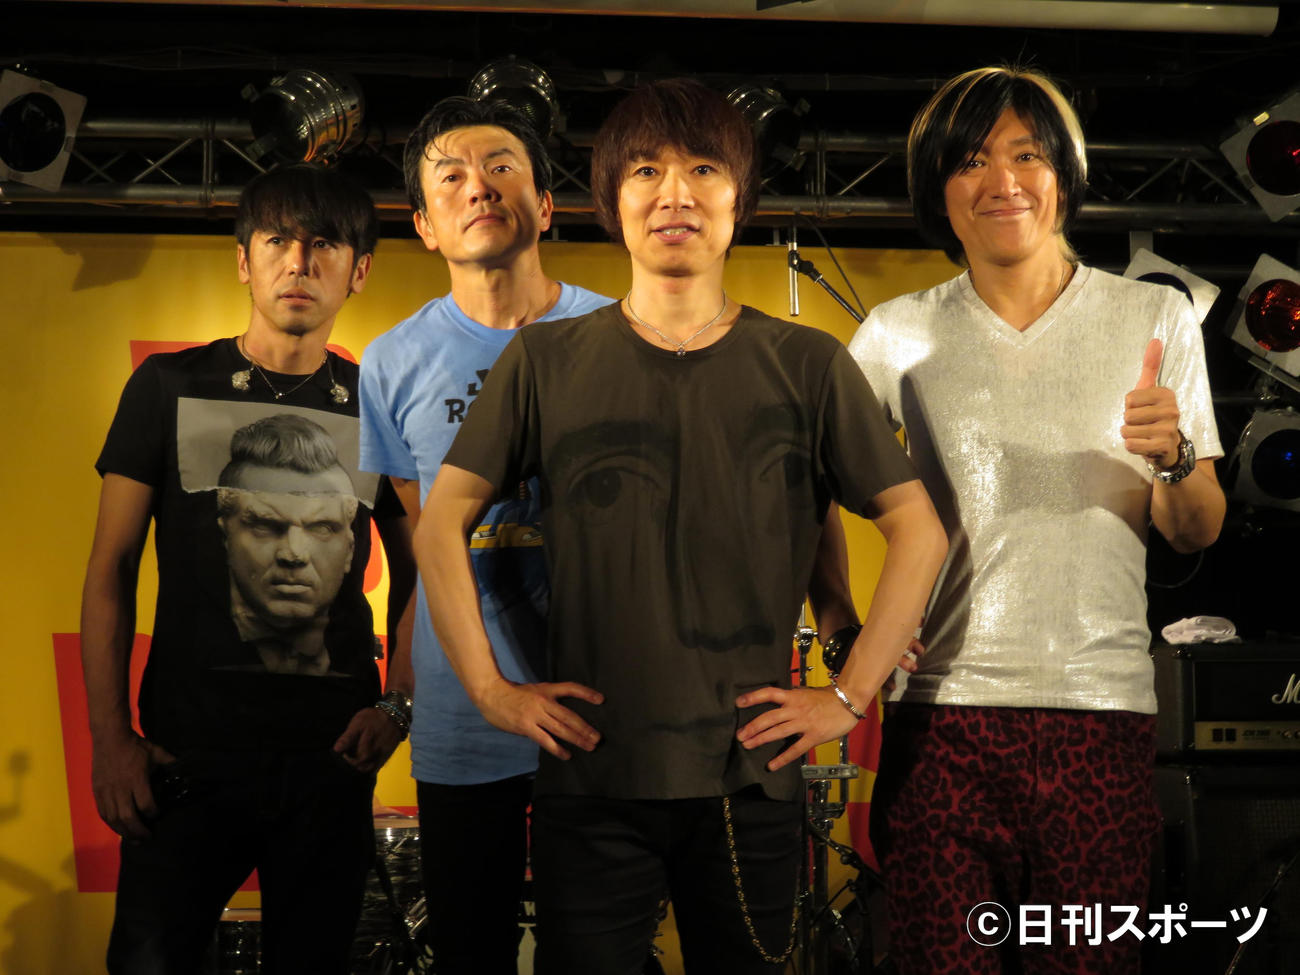 JUN SKY WALKER(S)左から寺岡呼人、小林雅之、宮田和弥、森純太(2016年9月7日)